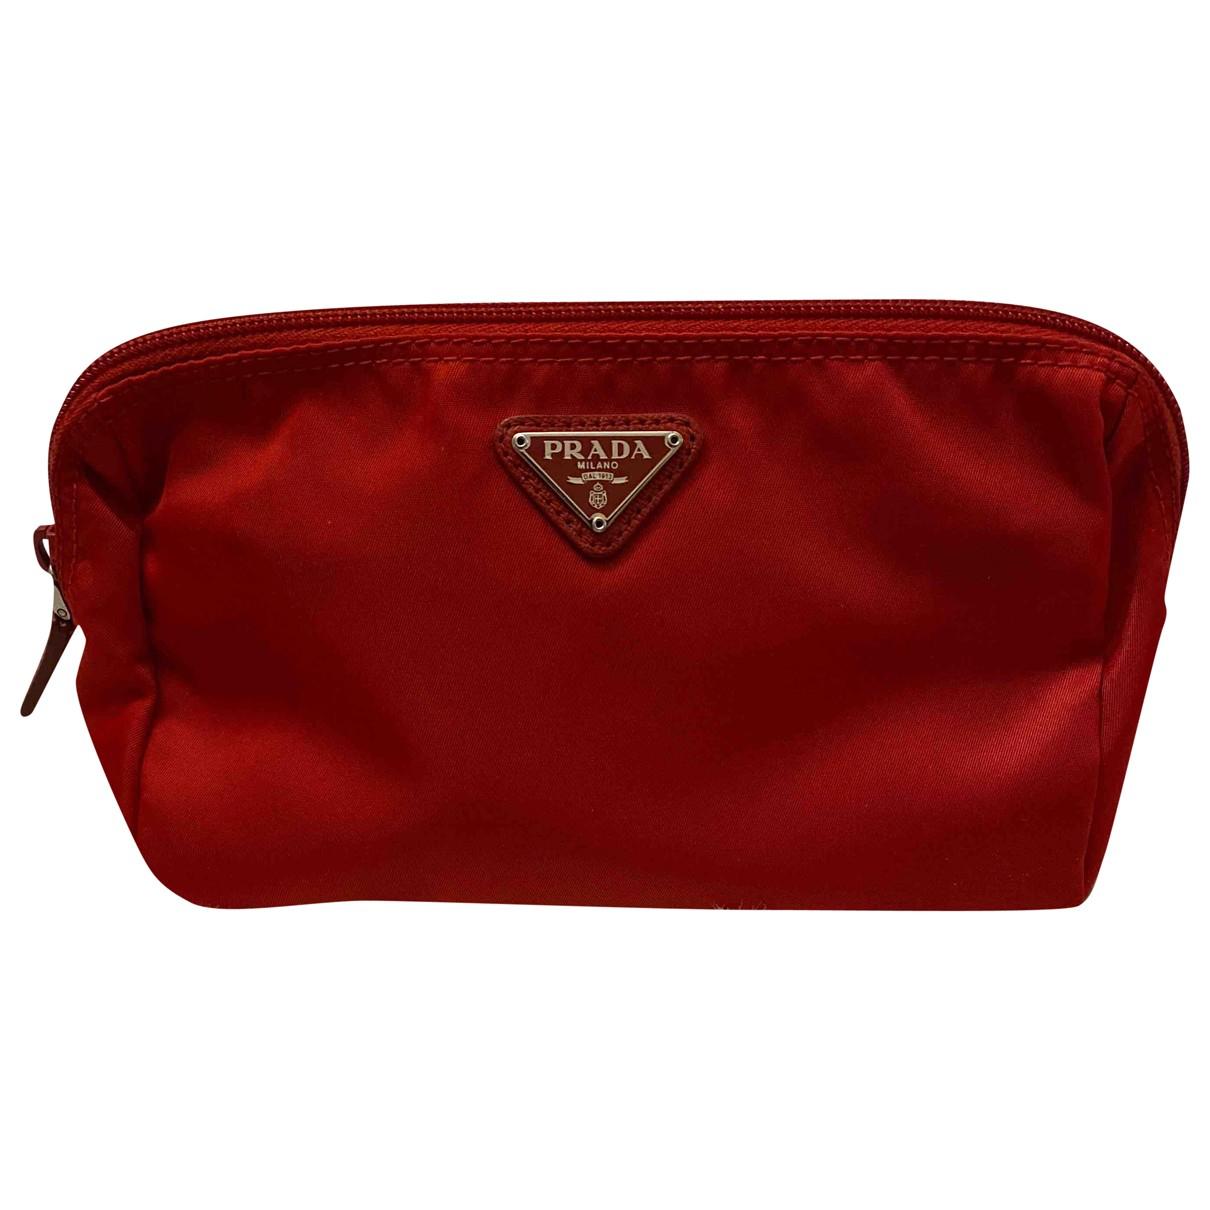 Prada - Pochette Re-Nylon pour femme - rouge